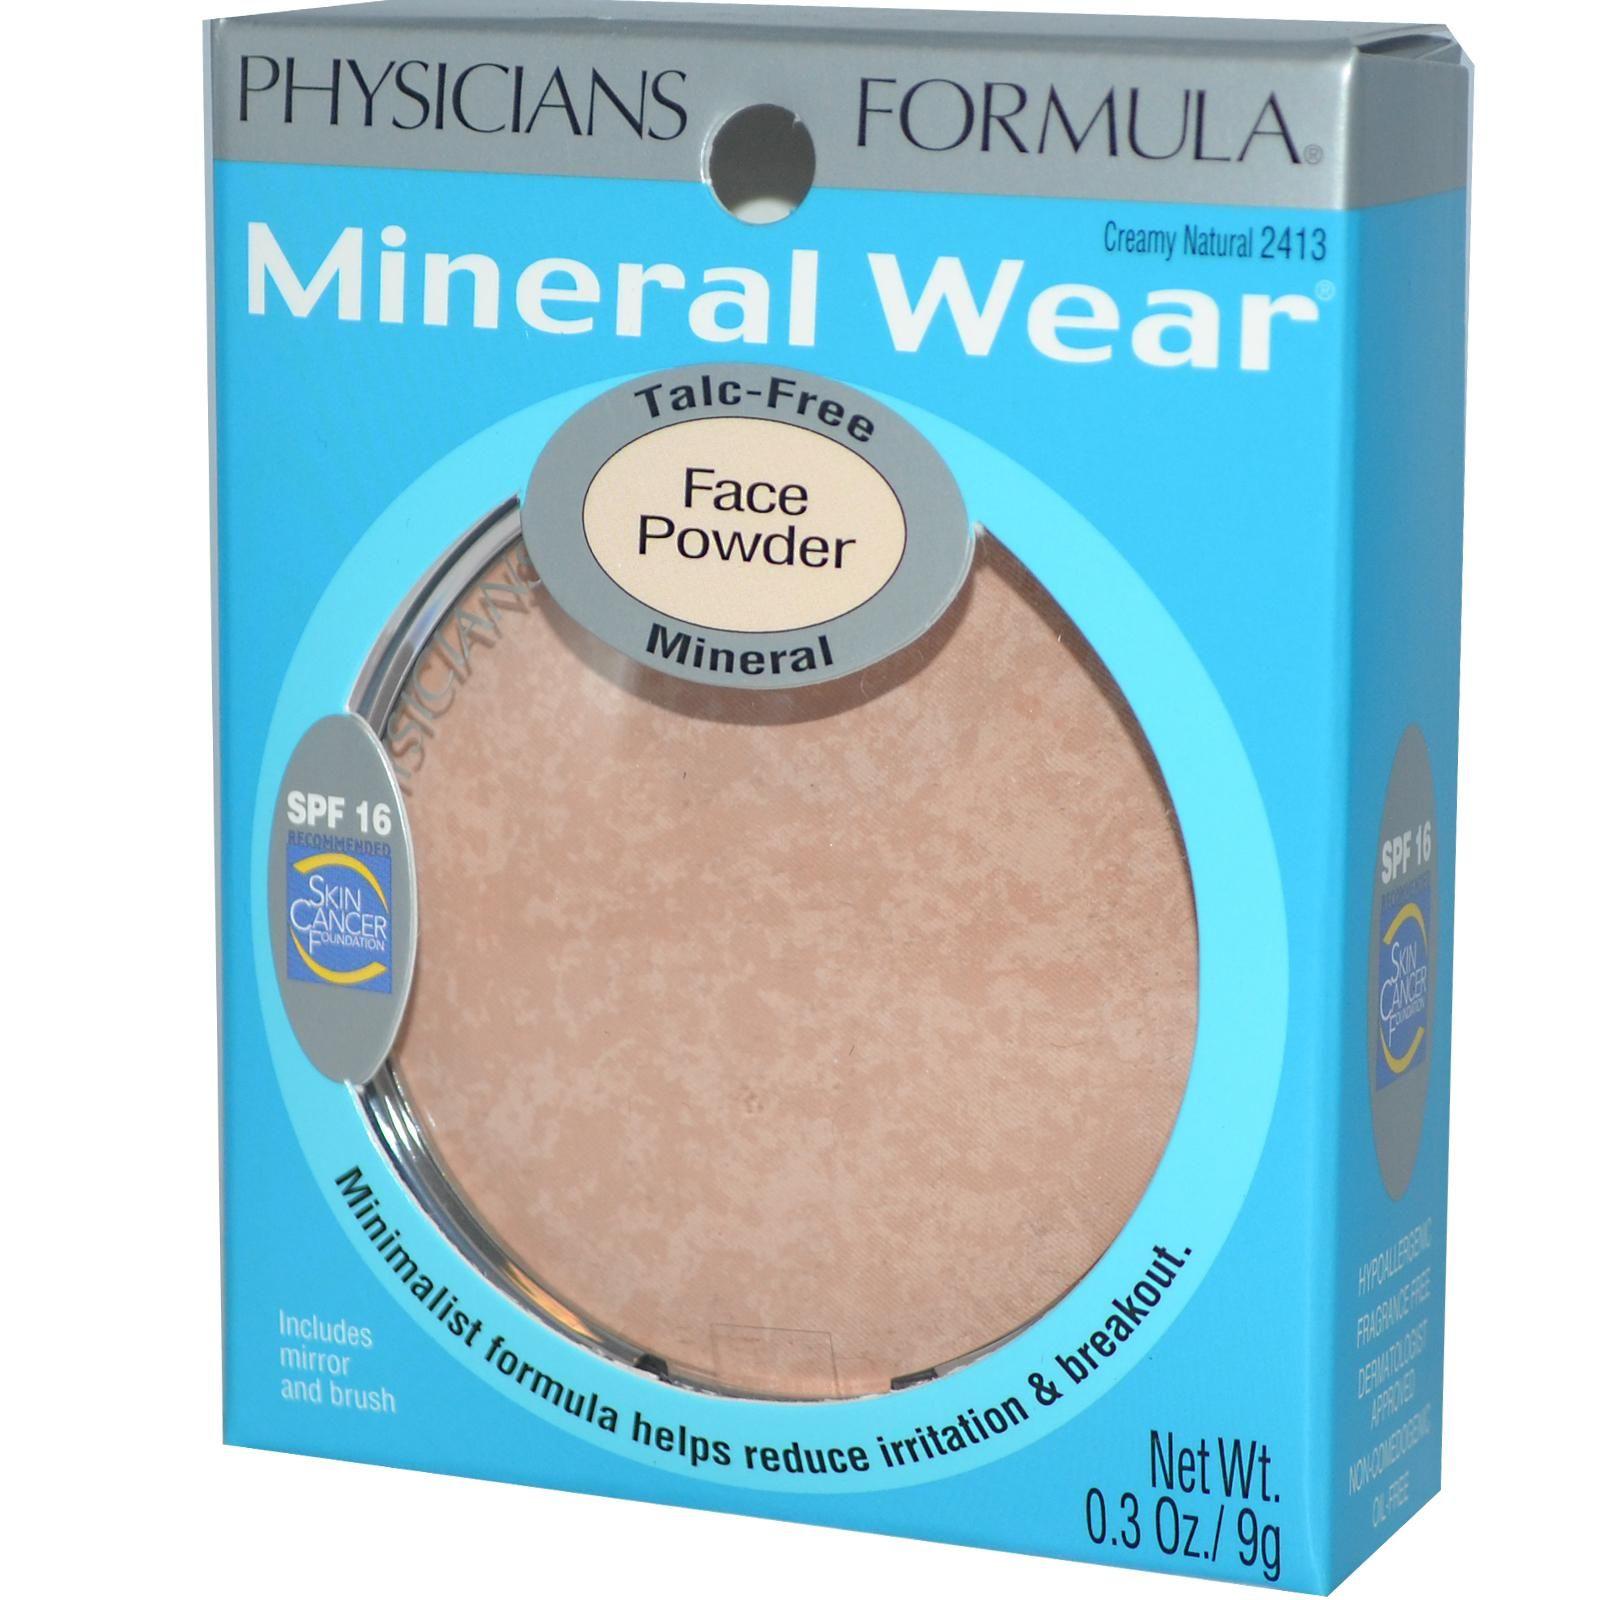 Physicians Formula, Mineral Wear, Face Powder, SPF 16